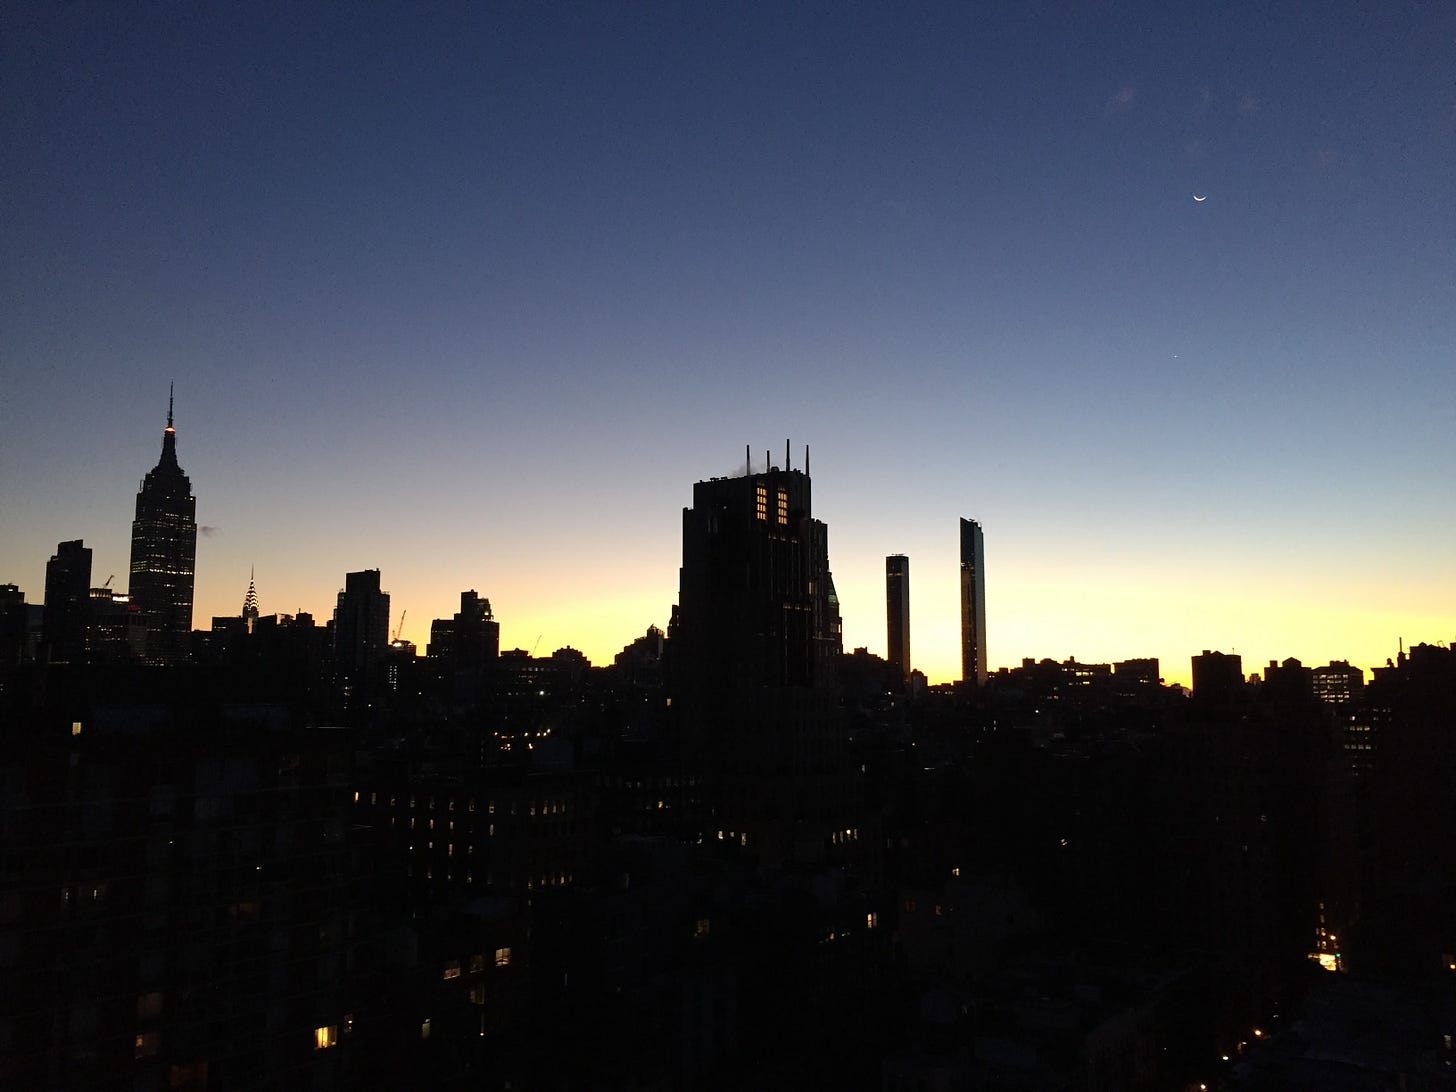 The sun rising across the skyline of New York.